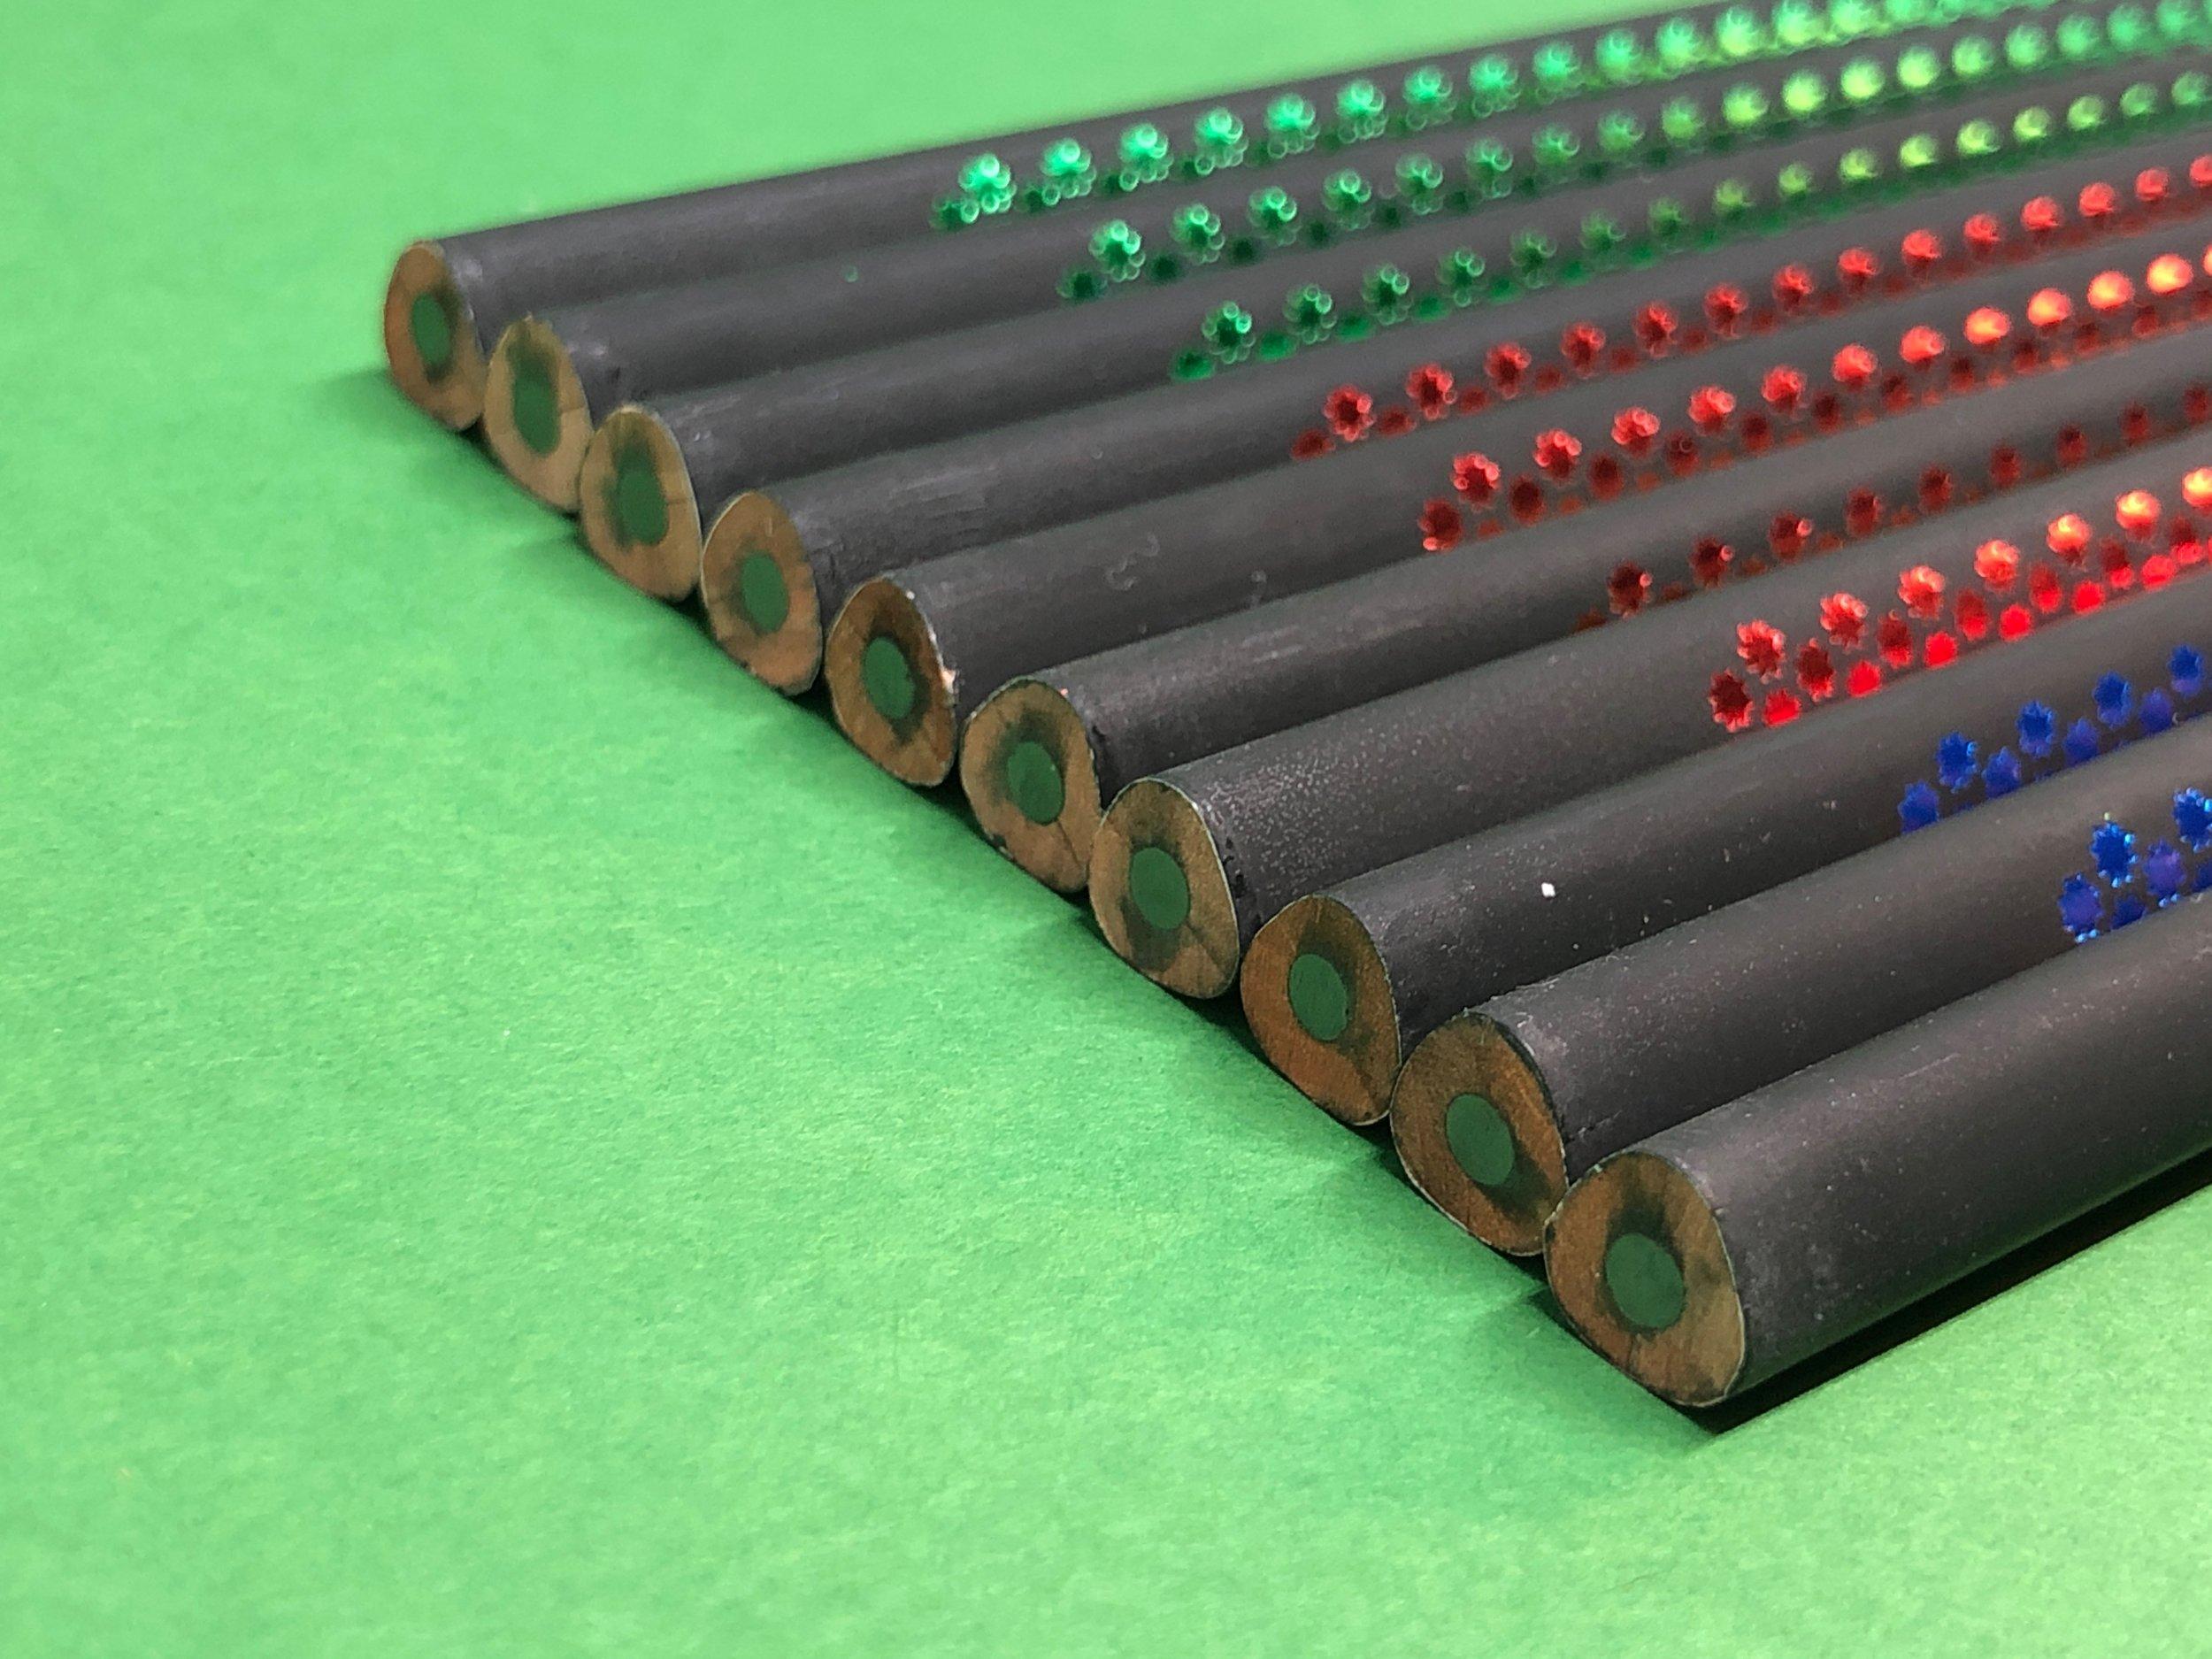 doms-fusion-pencil-5.jpg